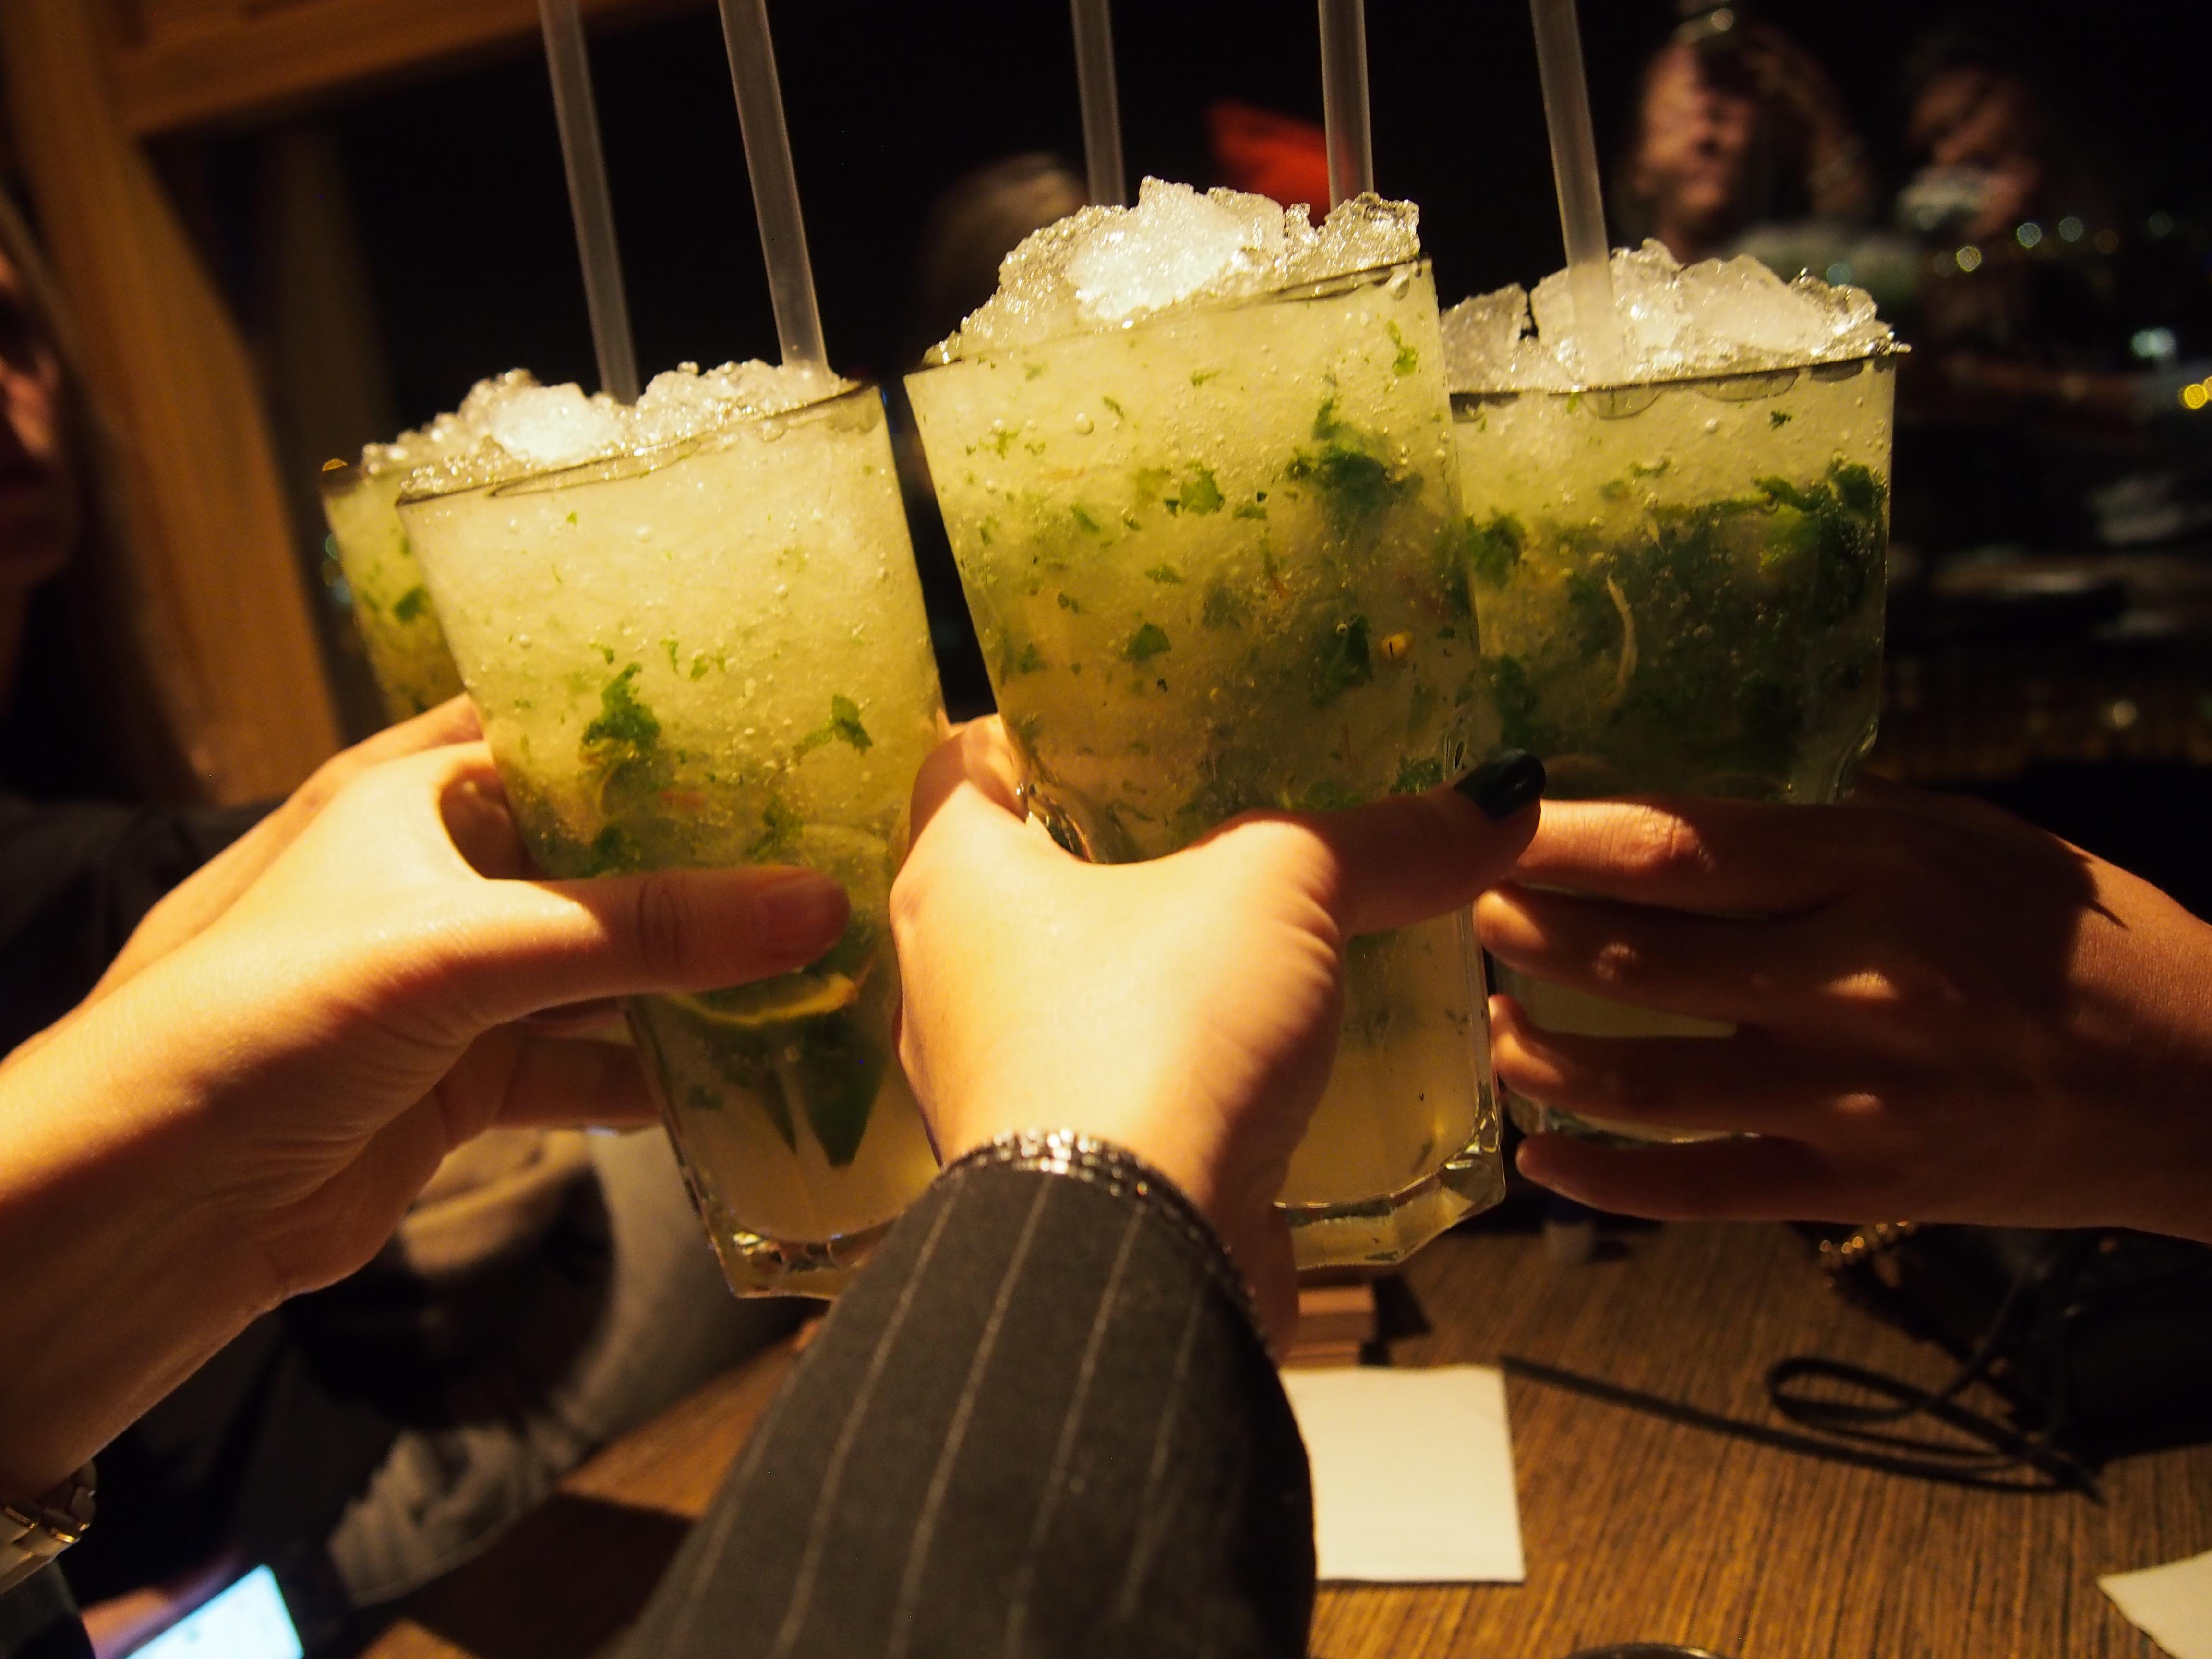 Cocktails at Radison Blue Skylounge in Riga Latvia